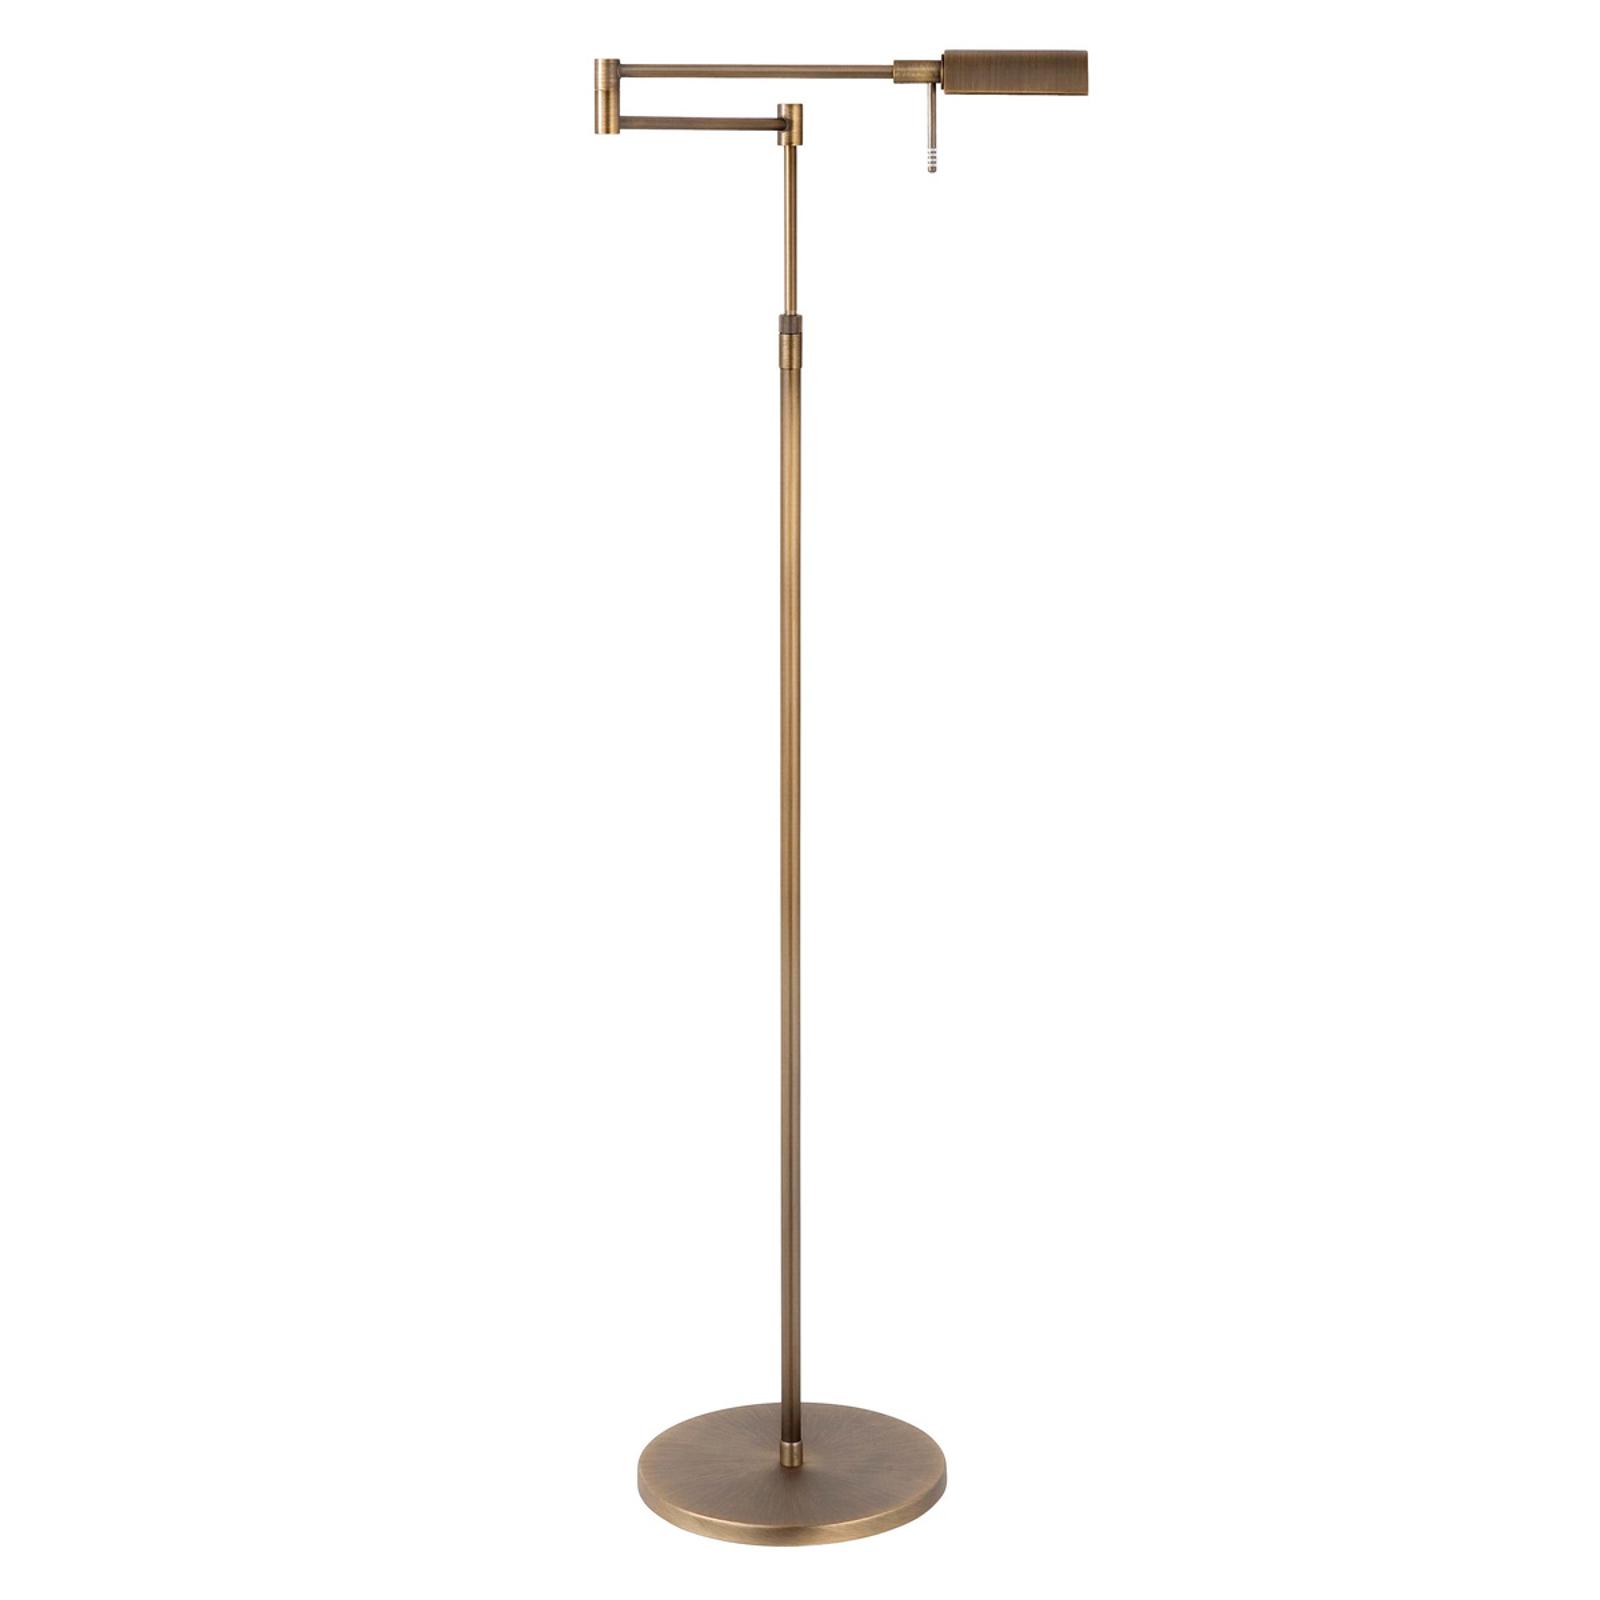 Klasyczna lampa stojąca LED New Bari